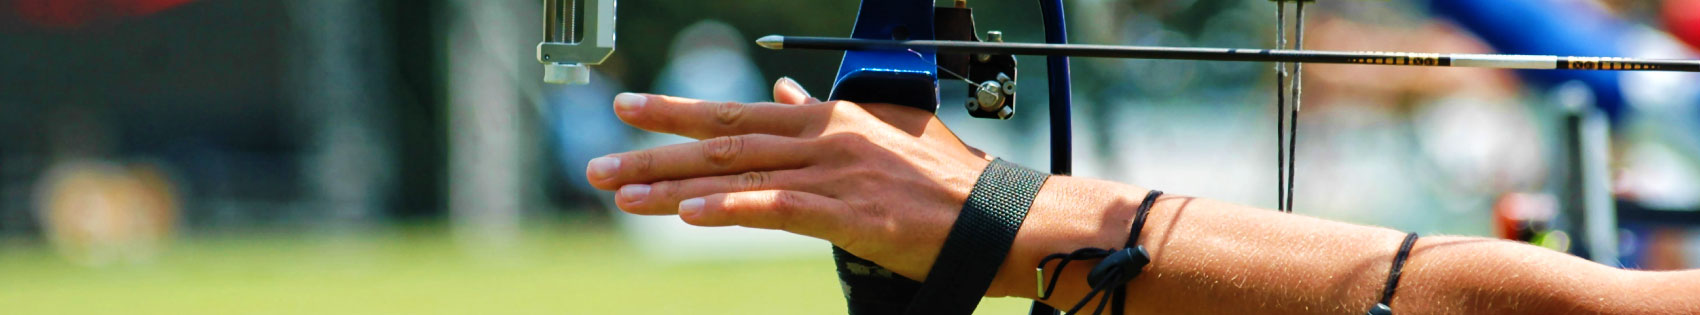 Archery's Hand